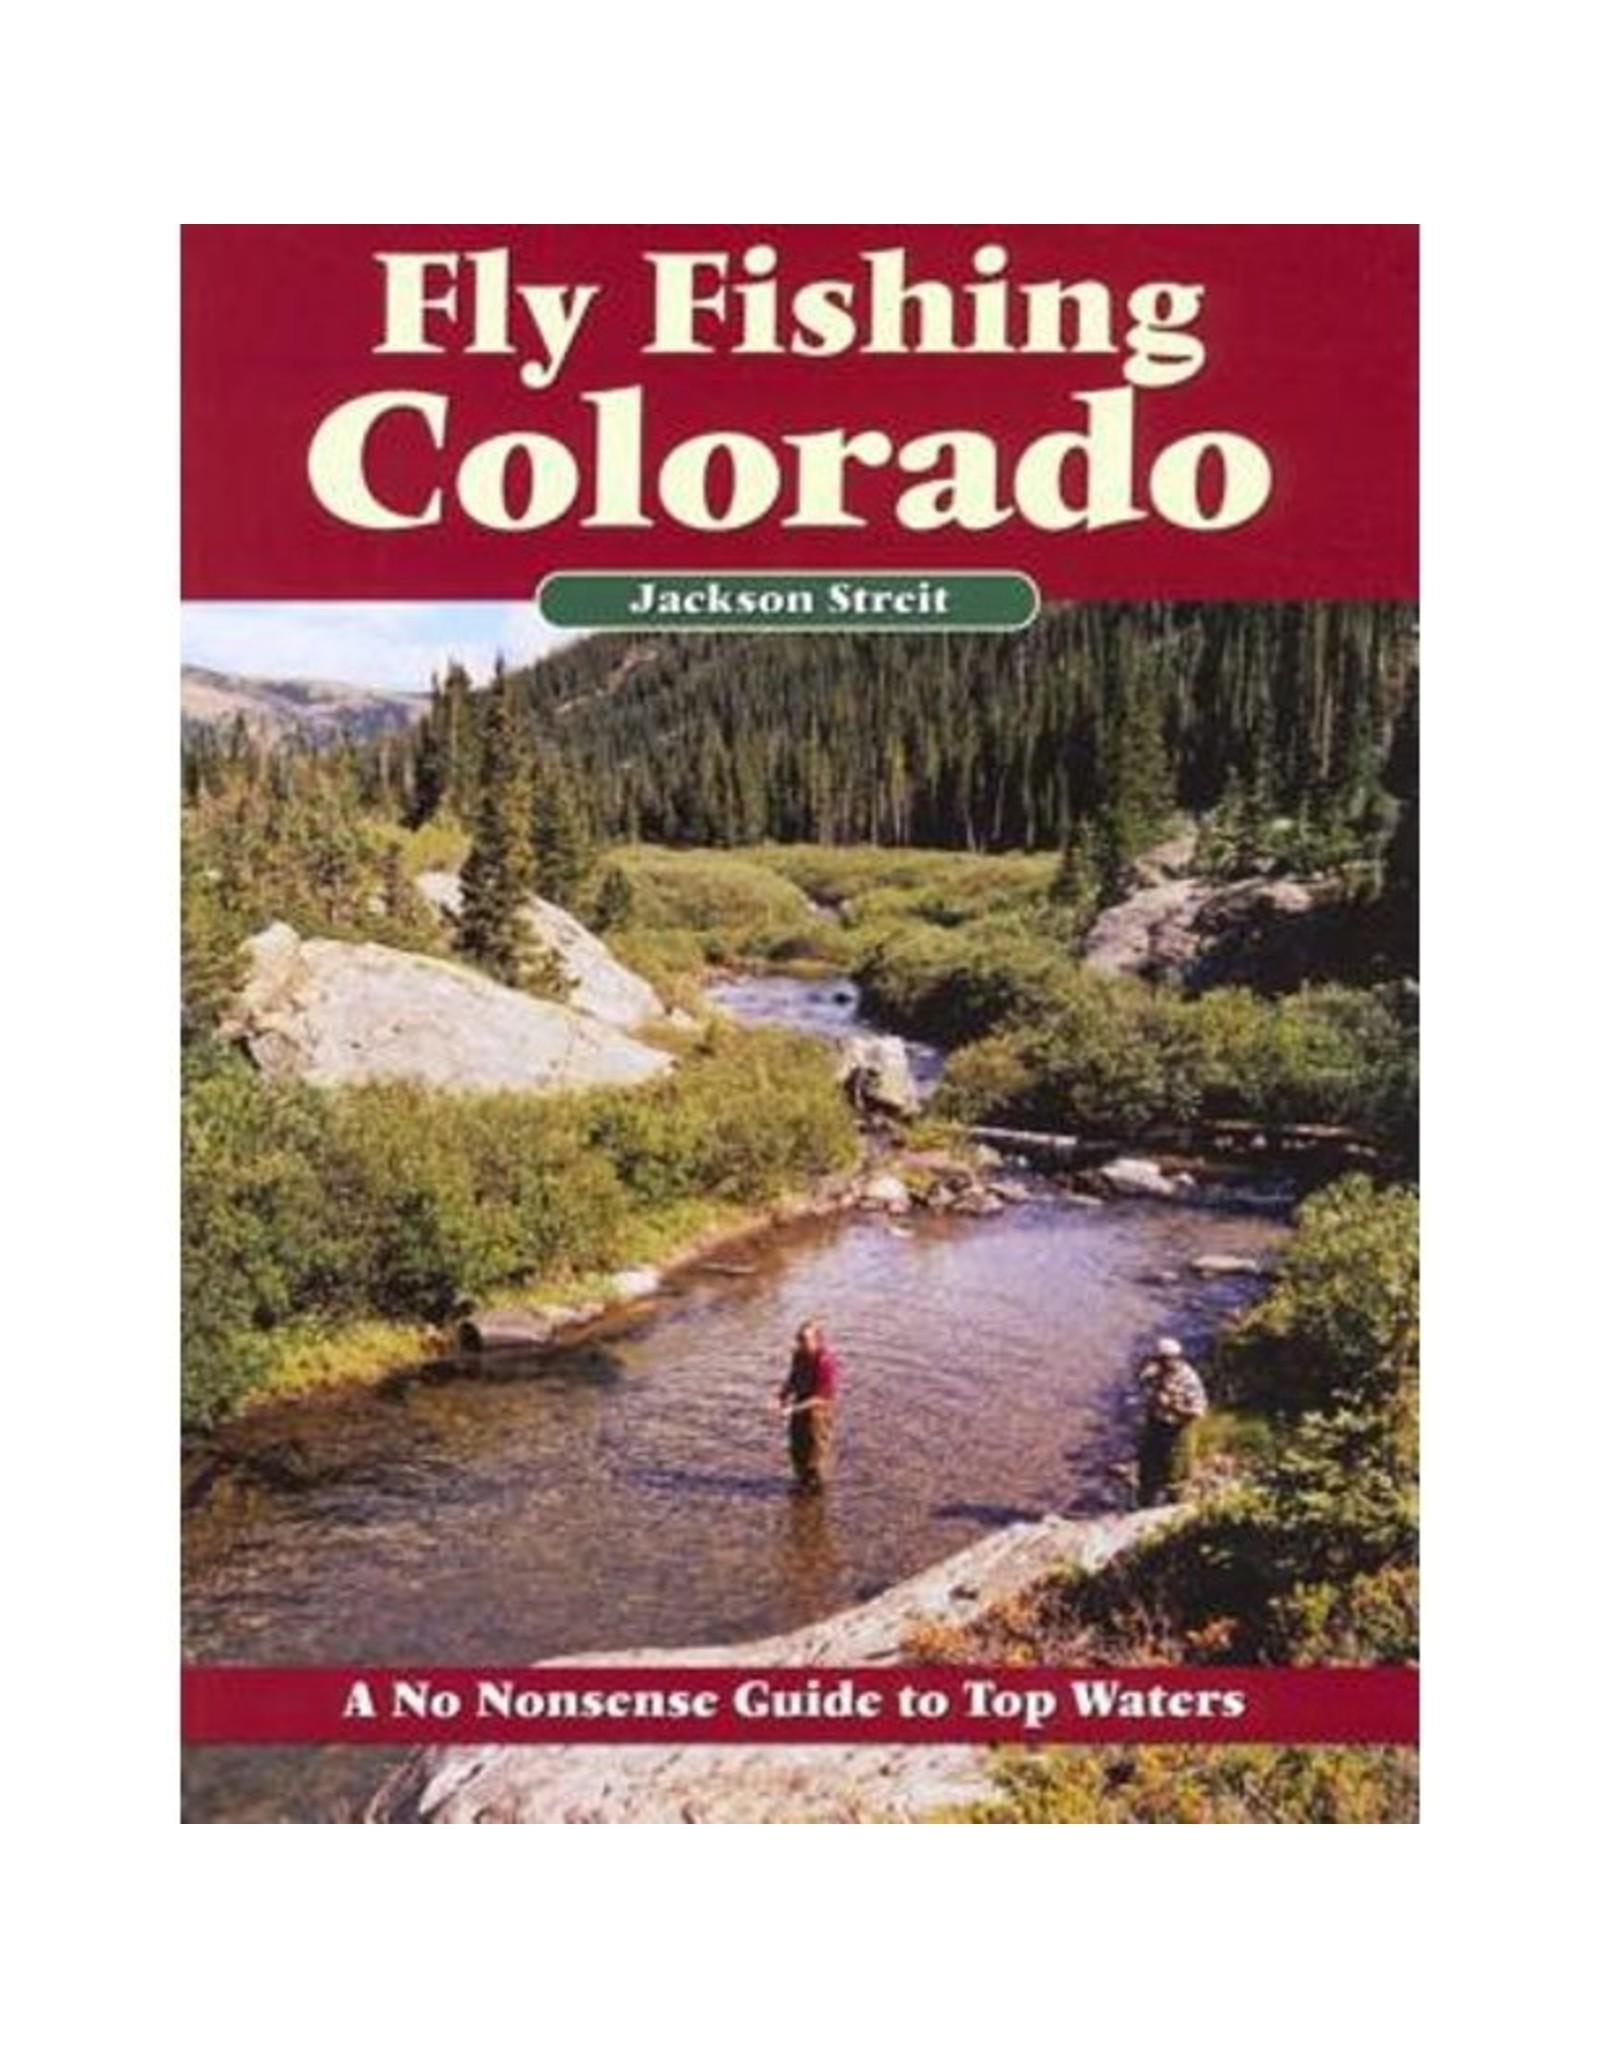 Angler's Book Supply Fly Fishing Colorado - Jackson Streit